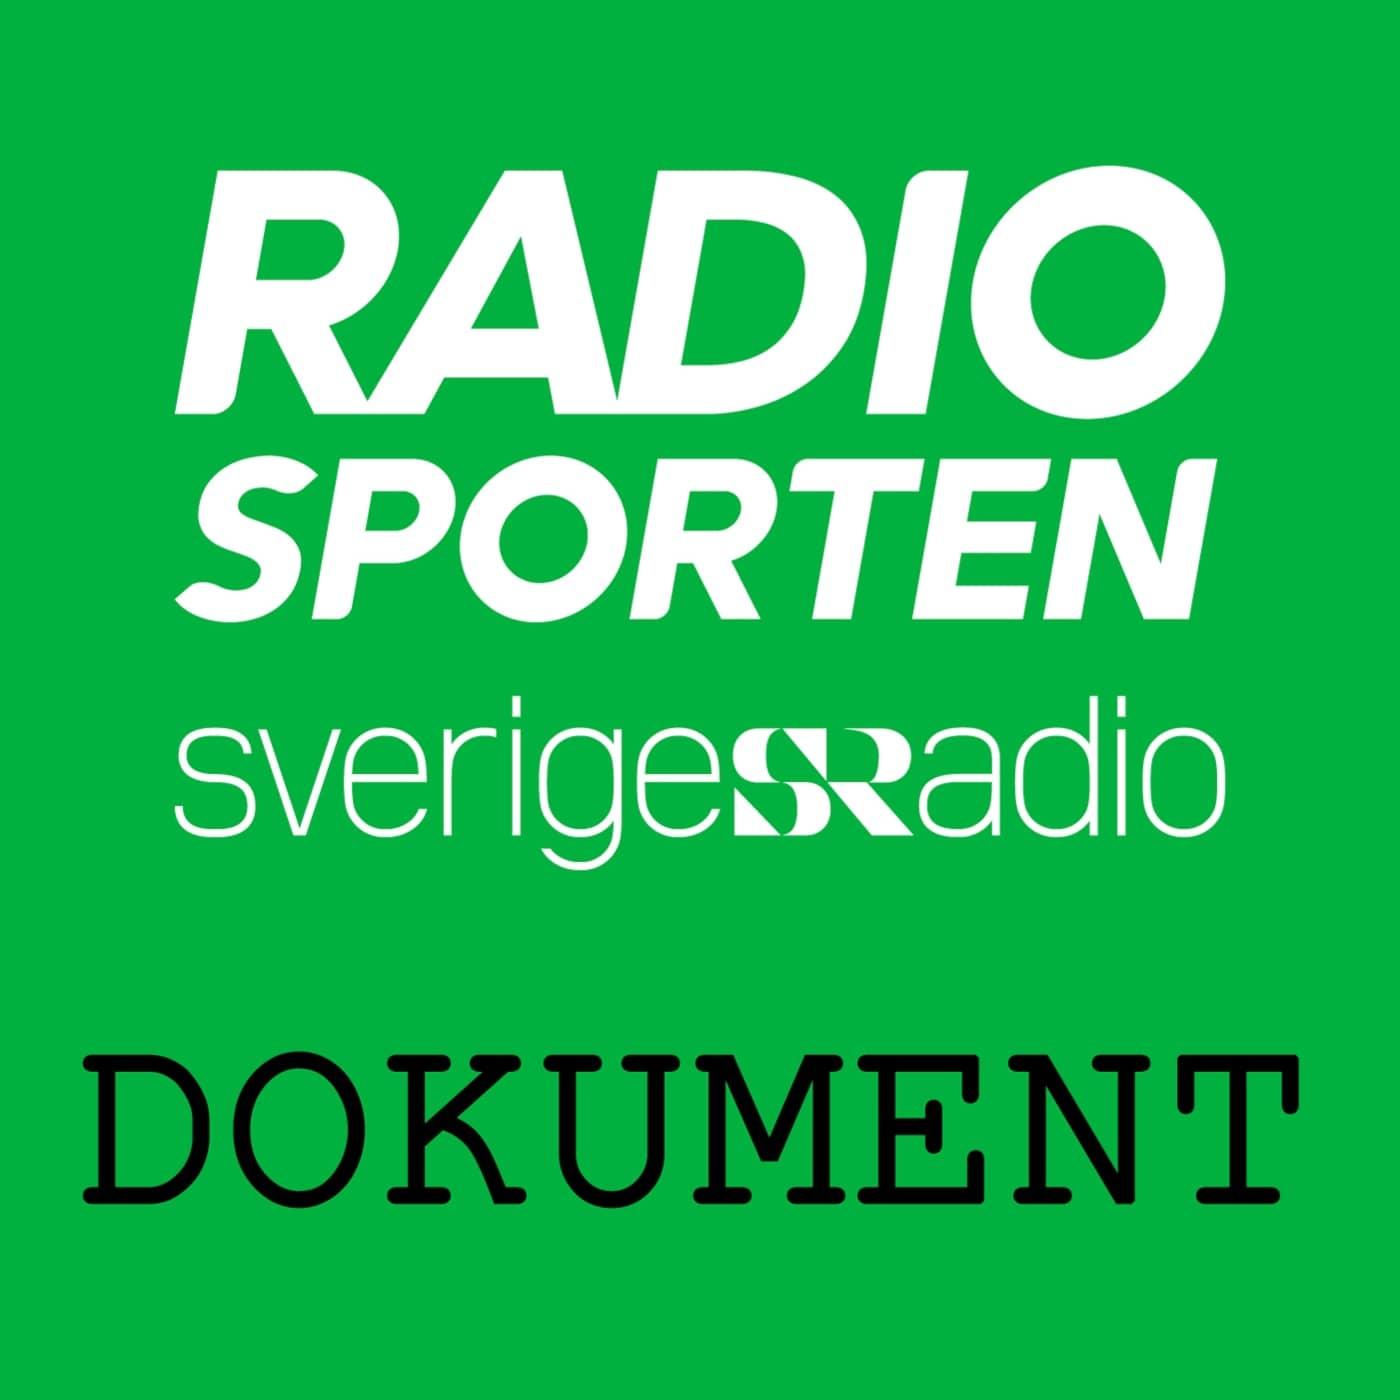 Radiosporten Dokument